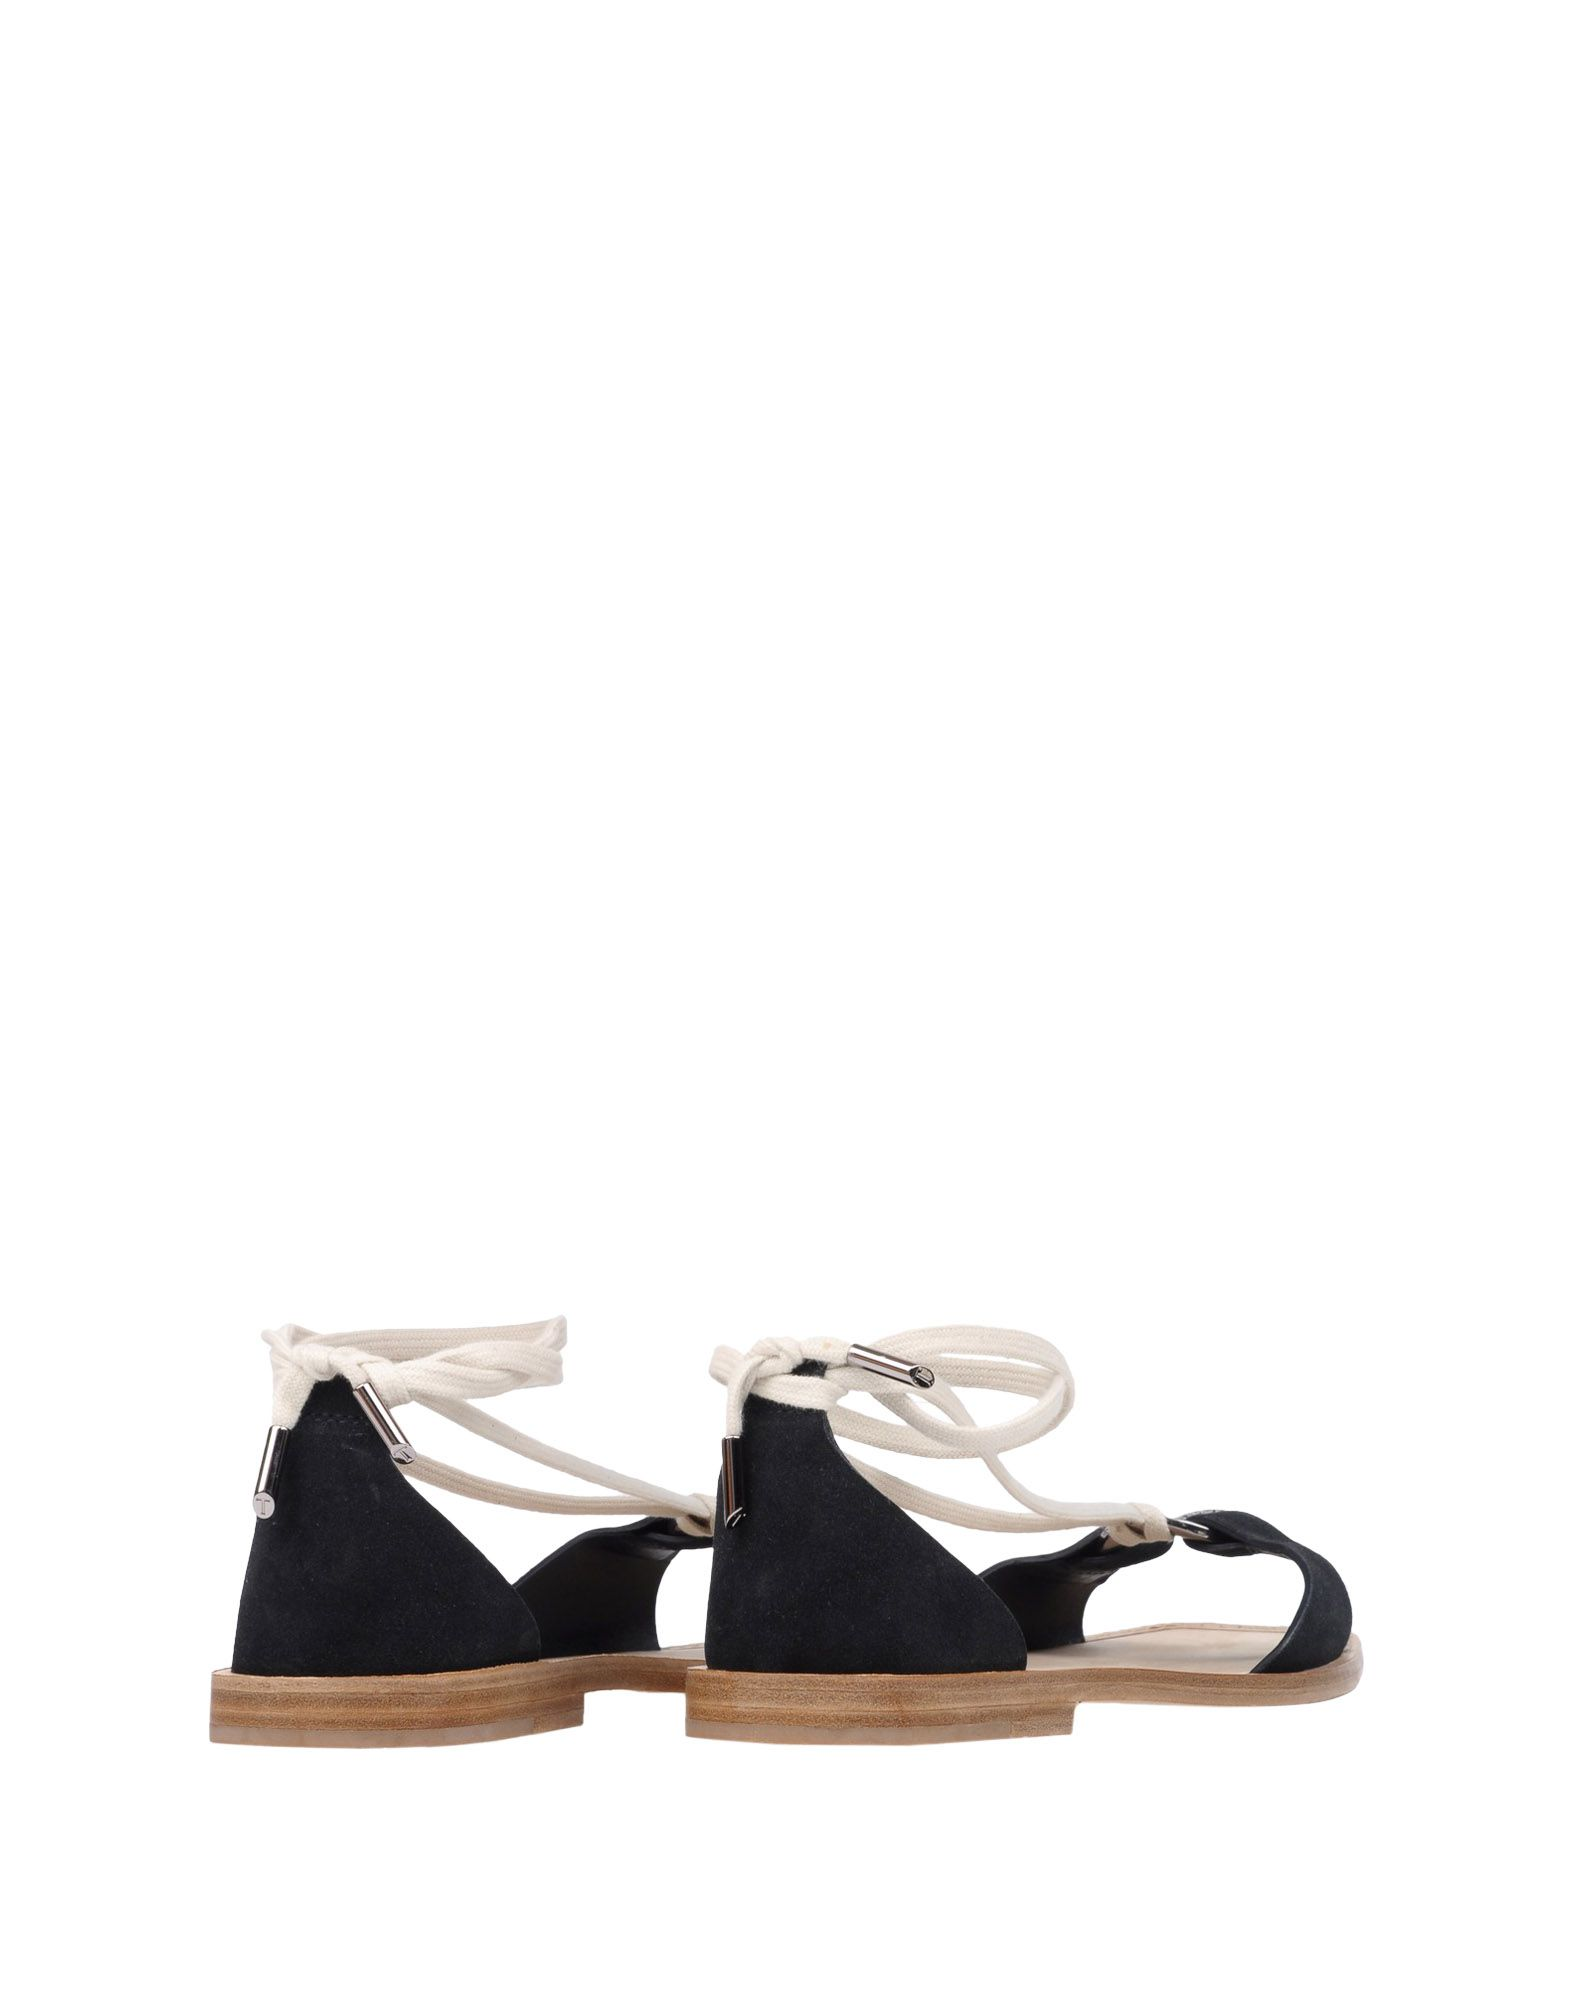 Stilvolle billige Schuhe Damen Tod's Sandalen Damen Schuhe  11175326PB 9e1c13